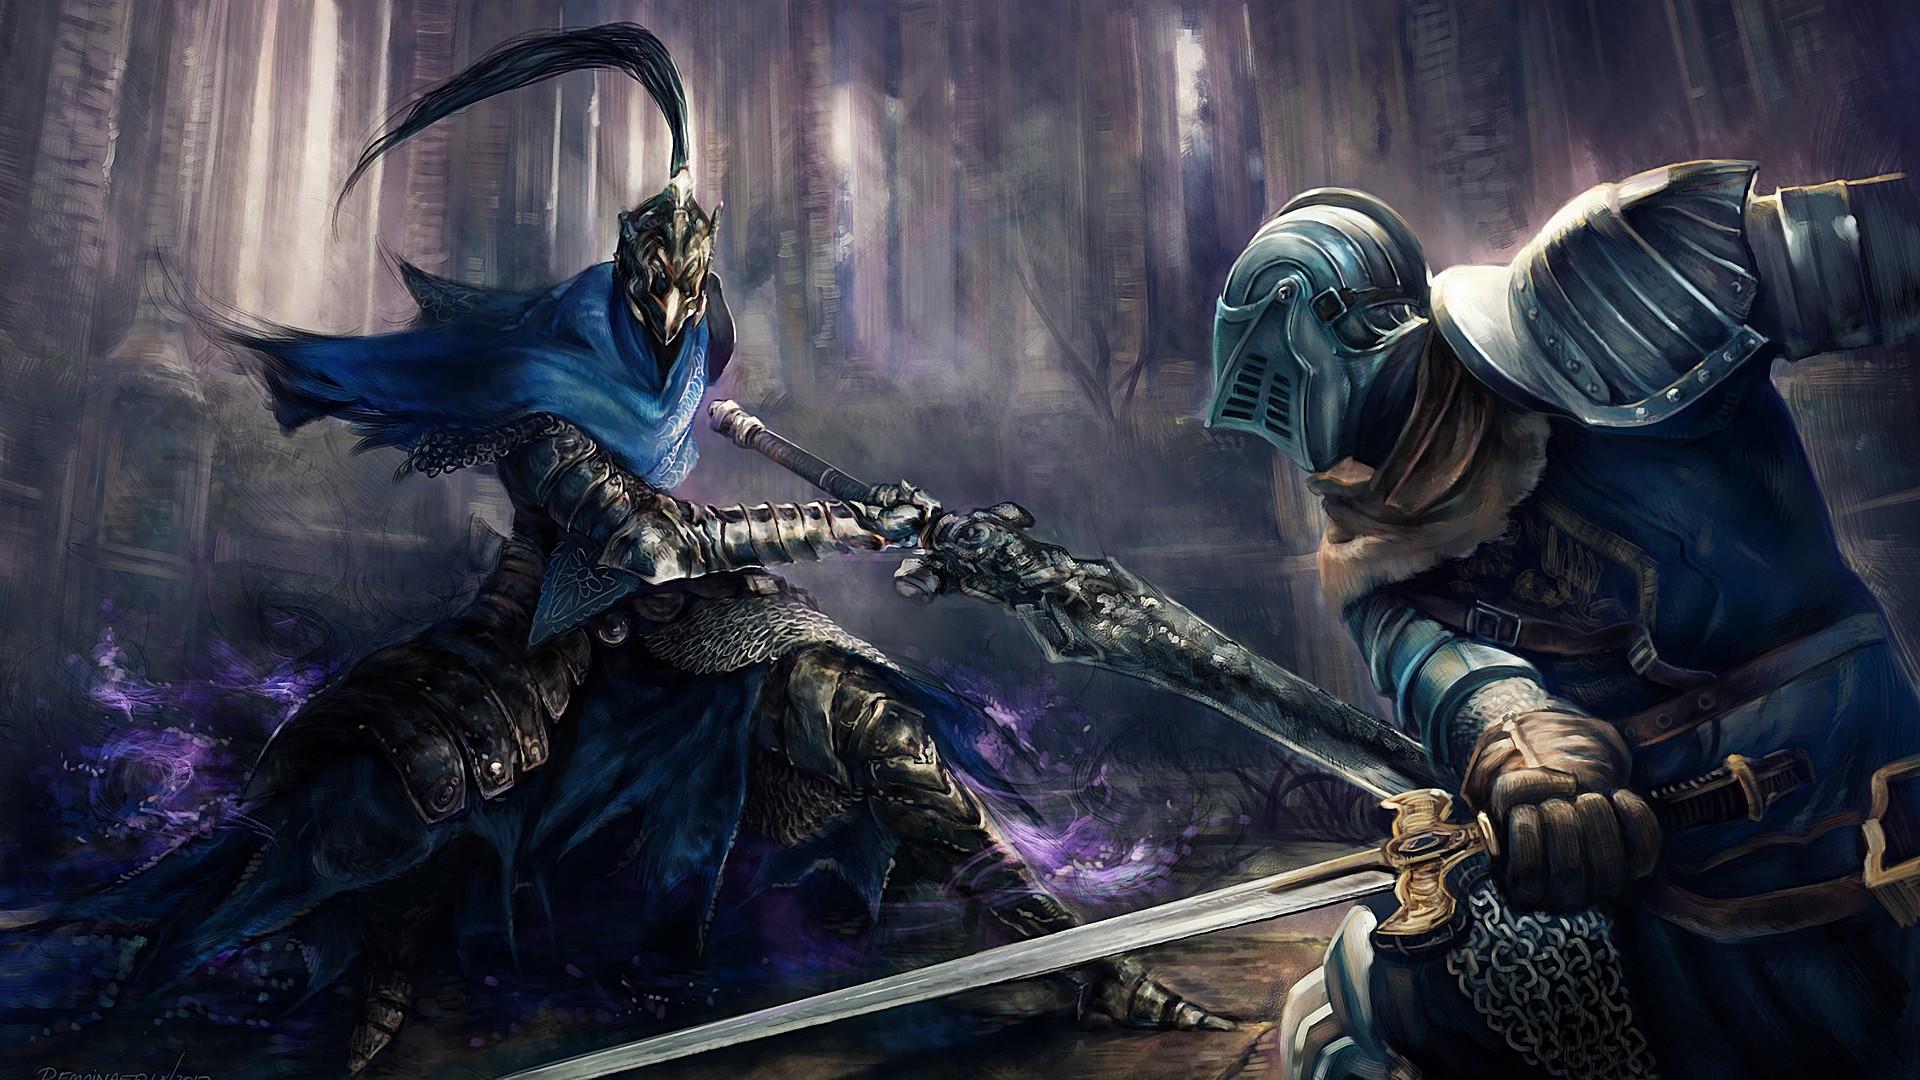 Fantasy Art Dark Souls Artorias The Abysswalker Games Screenshot Computer Wallpaper Pc Game